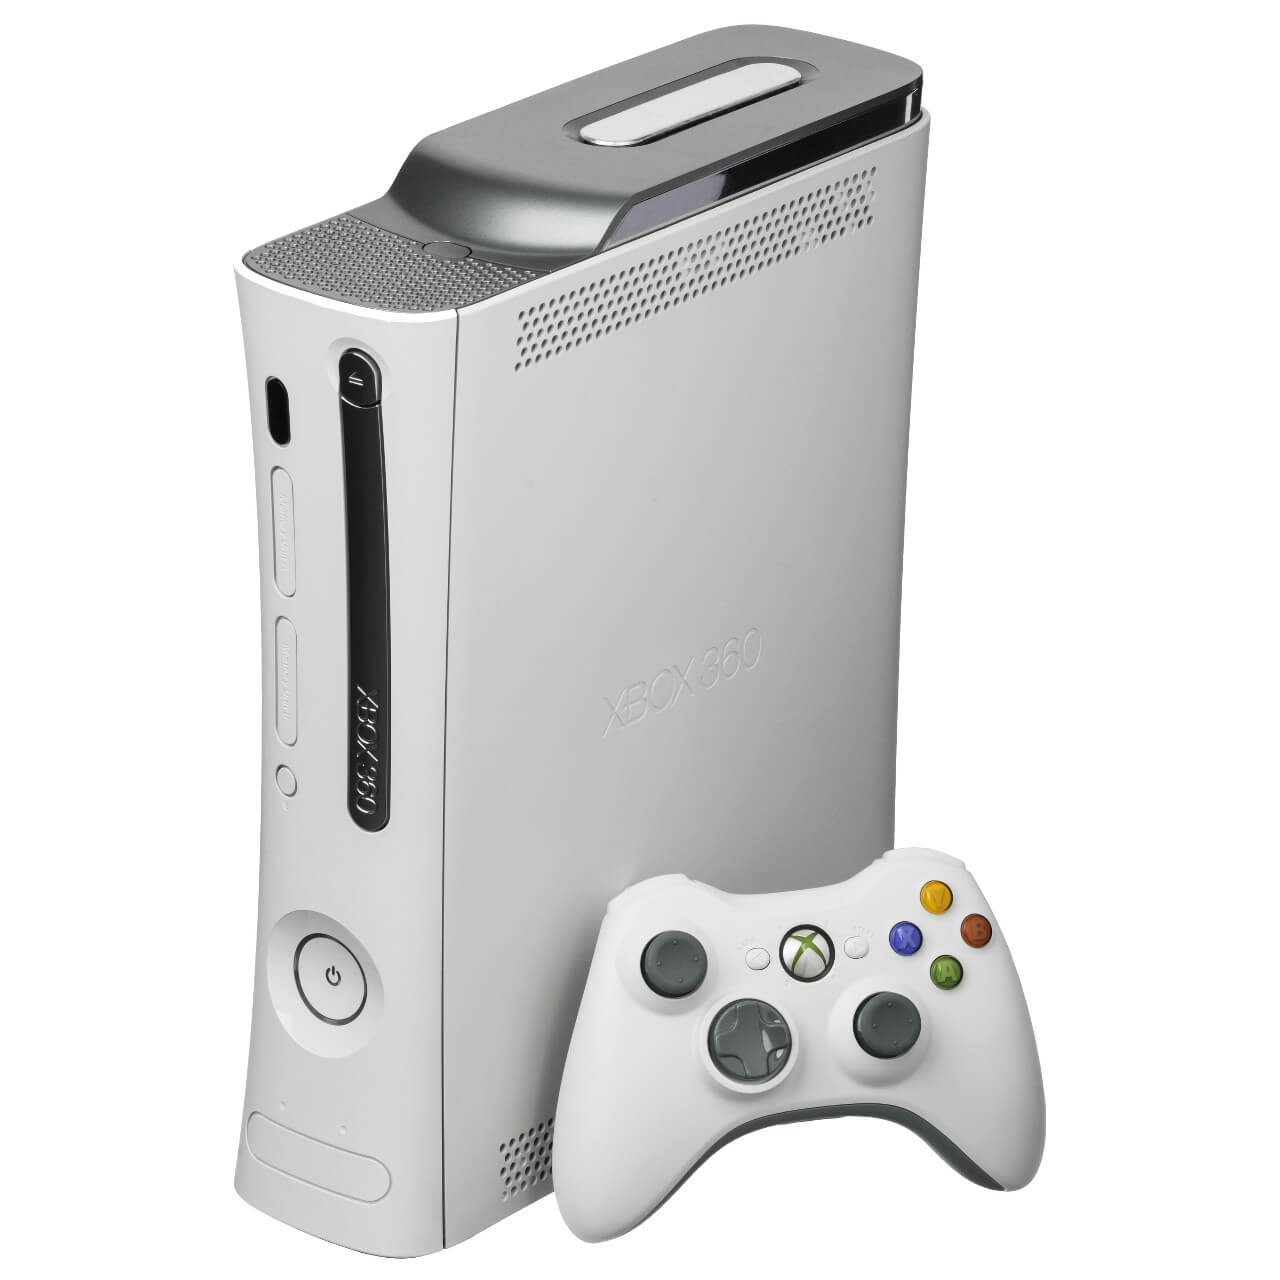 Xbox 360 completa 10 anos